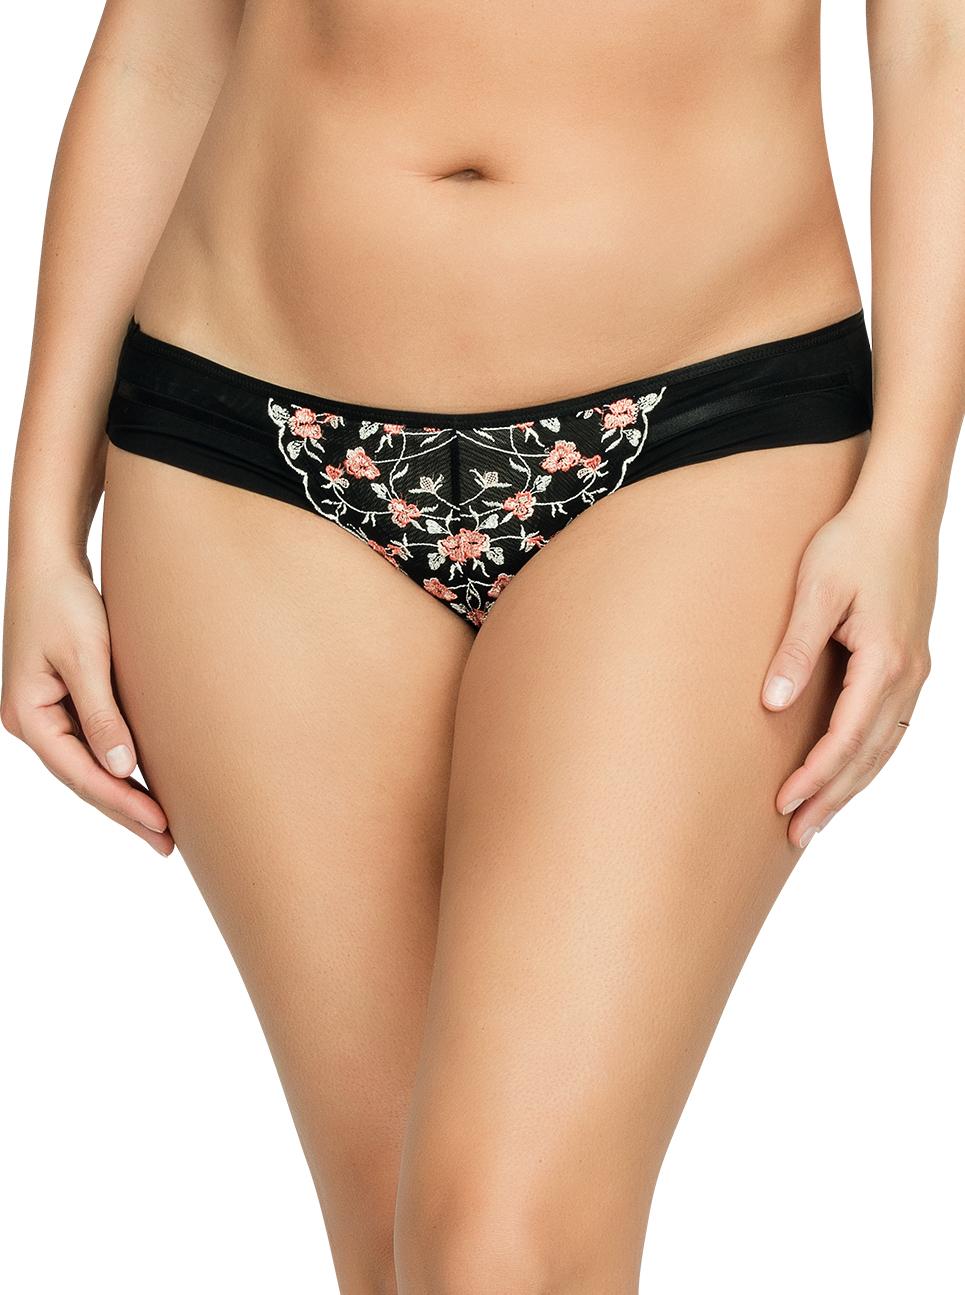 PARFAIT Briana BikiniP5673 BlackFloral Front1 - Briana Bikini Black Floral P5673